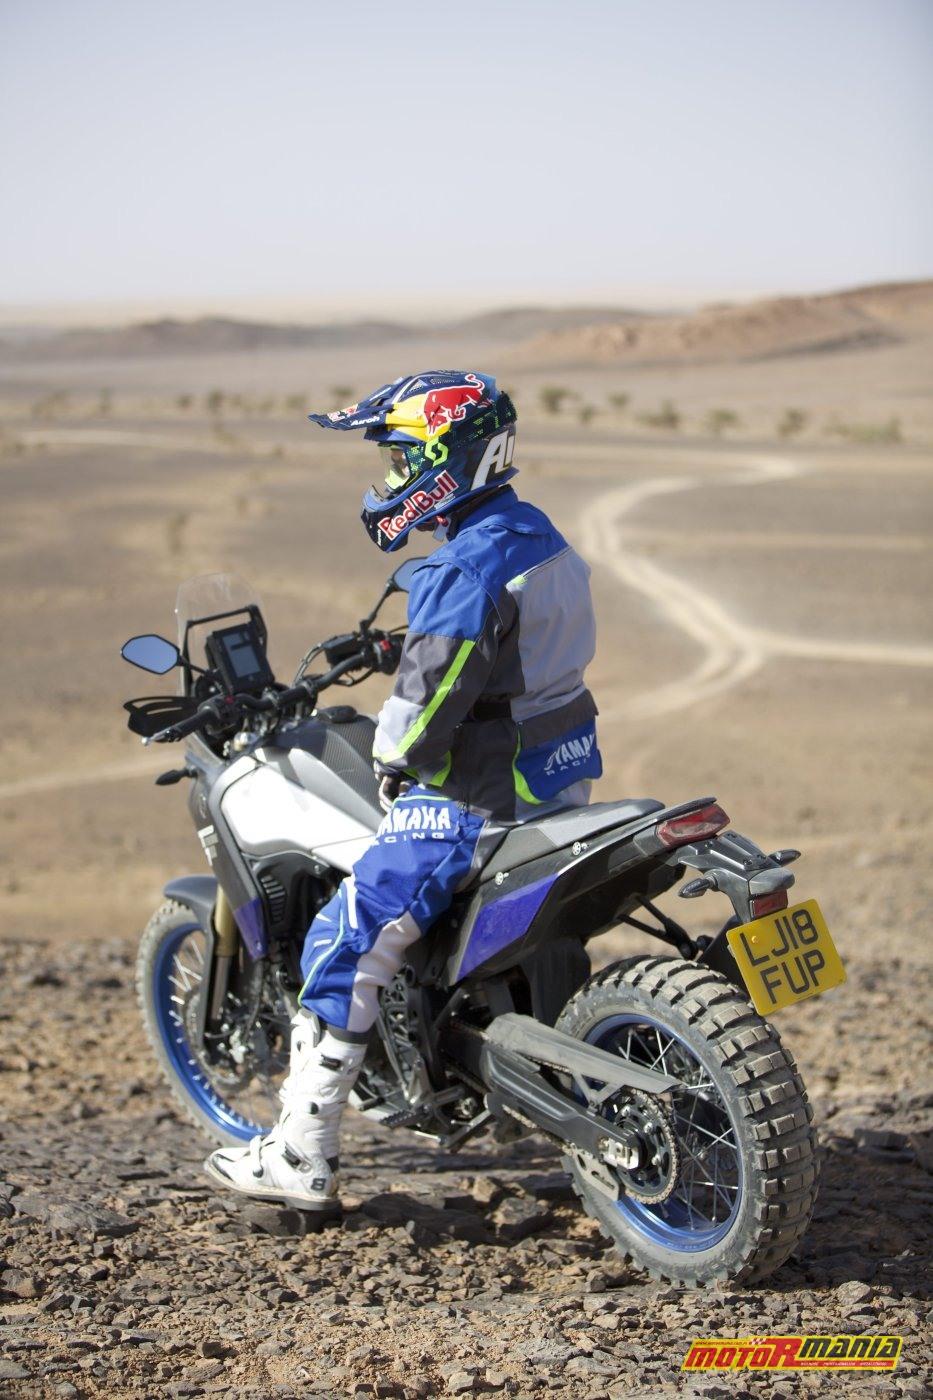 Yamaha Tenere 700 World Raid 2018 i Stephane Peterhansel (5)